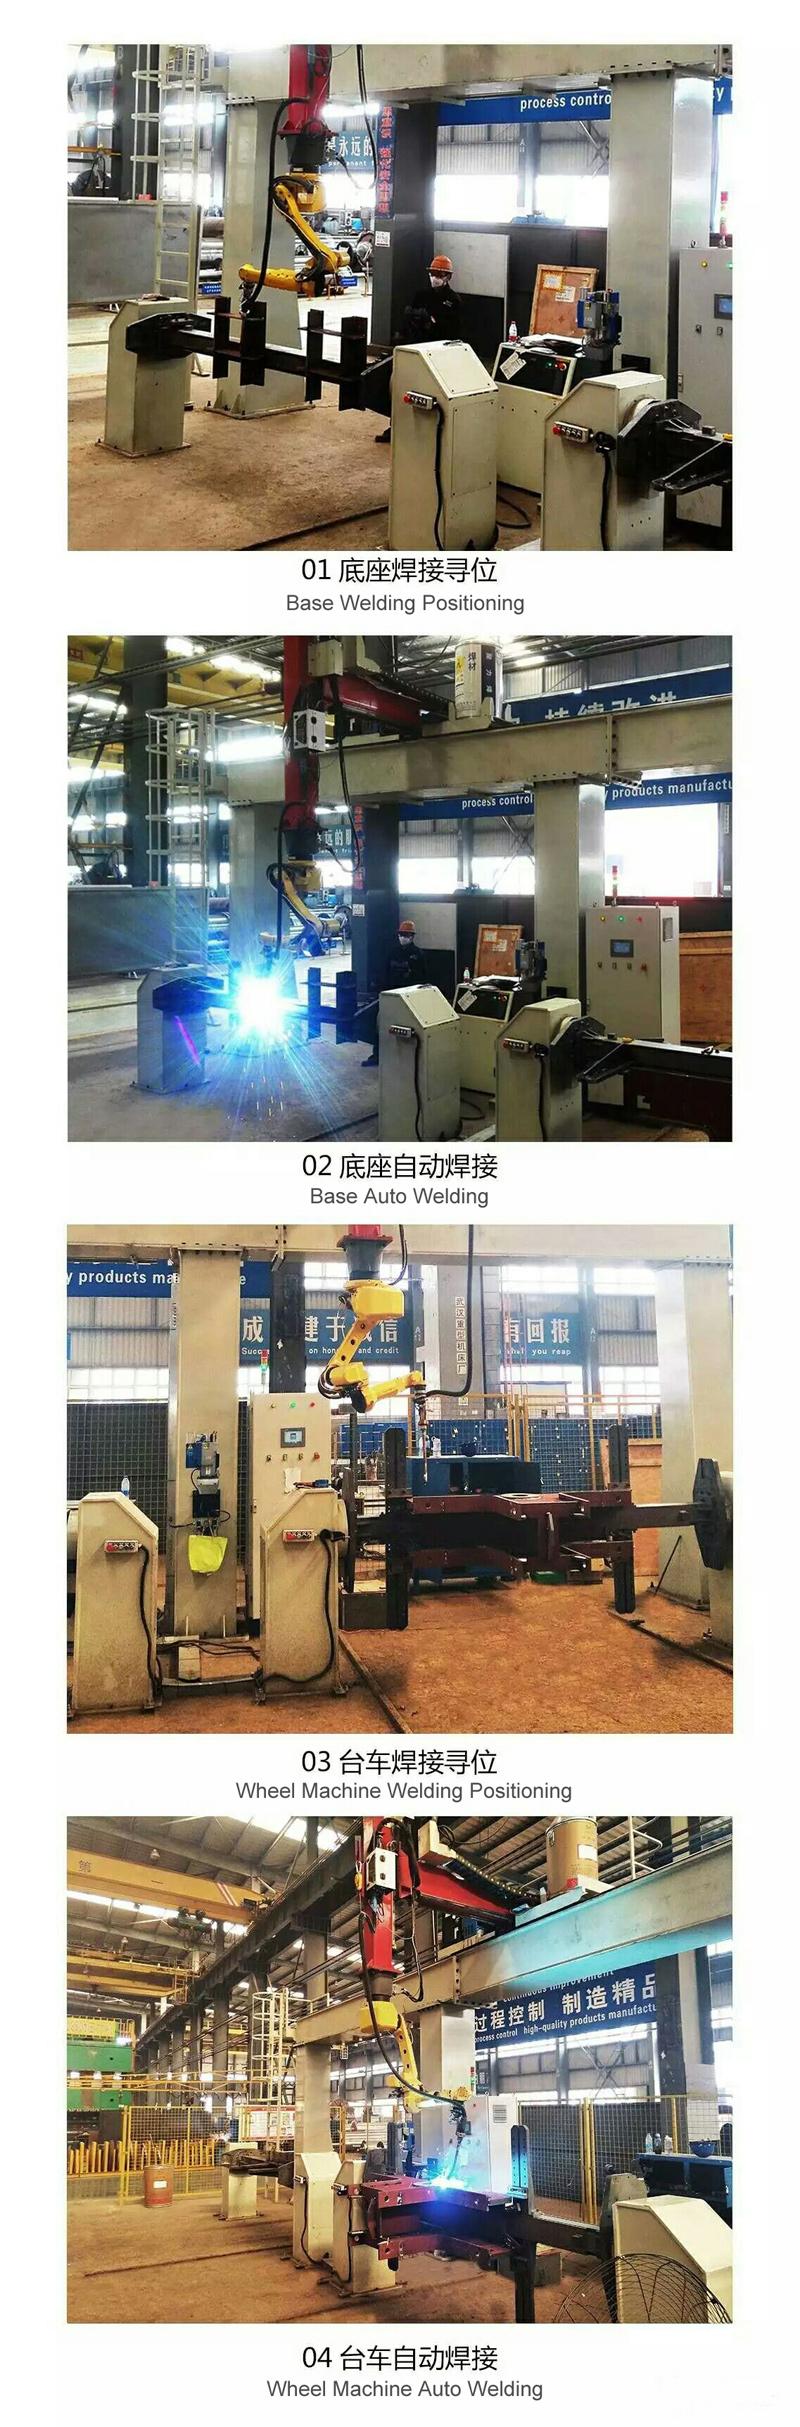 crane-wheel-machine-welding-robot